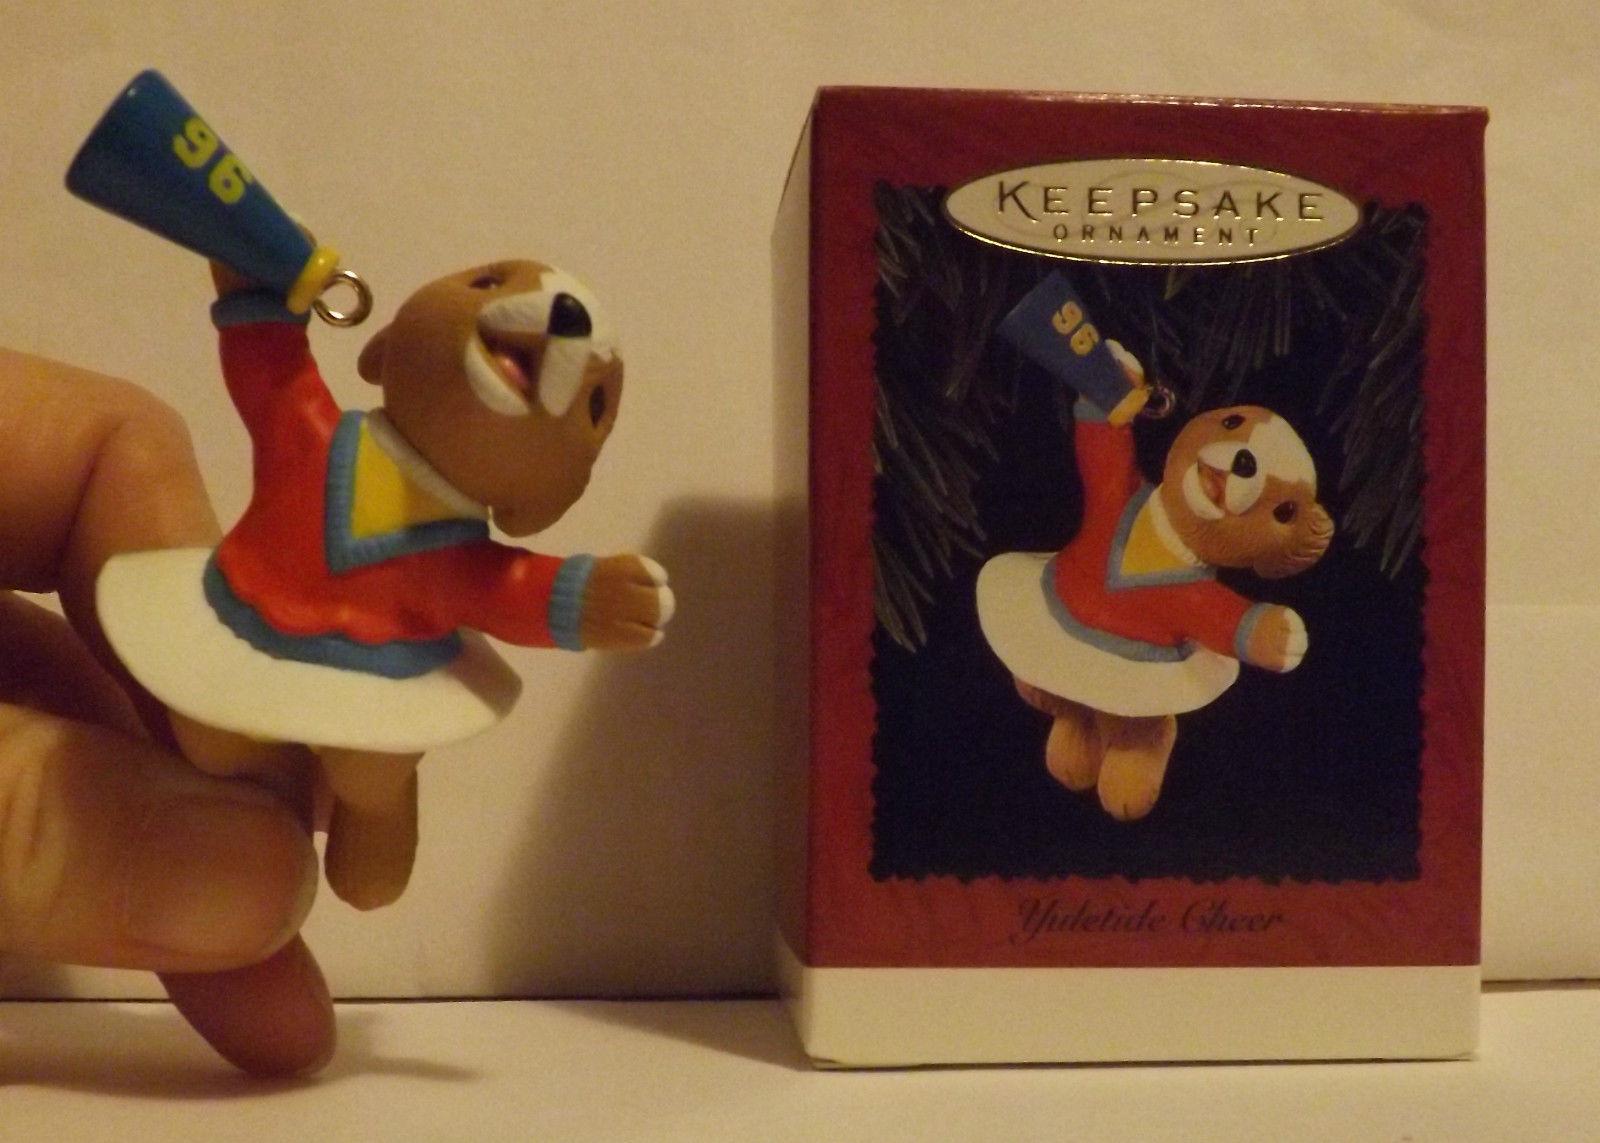 Hallmark Keepsake Ornament Yuletide Cheer 1996